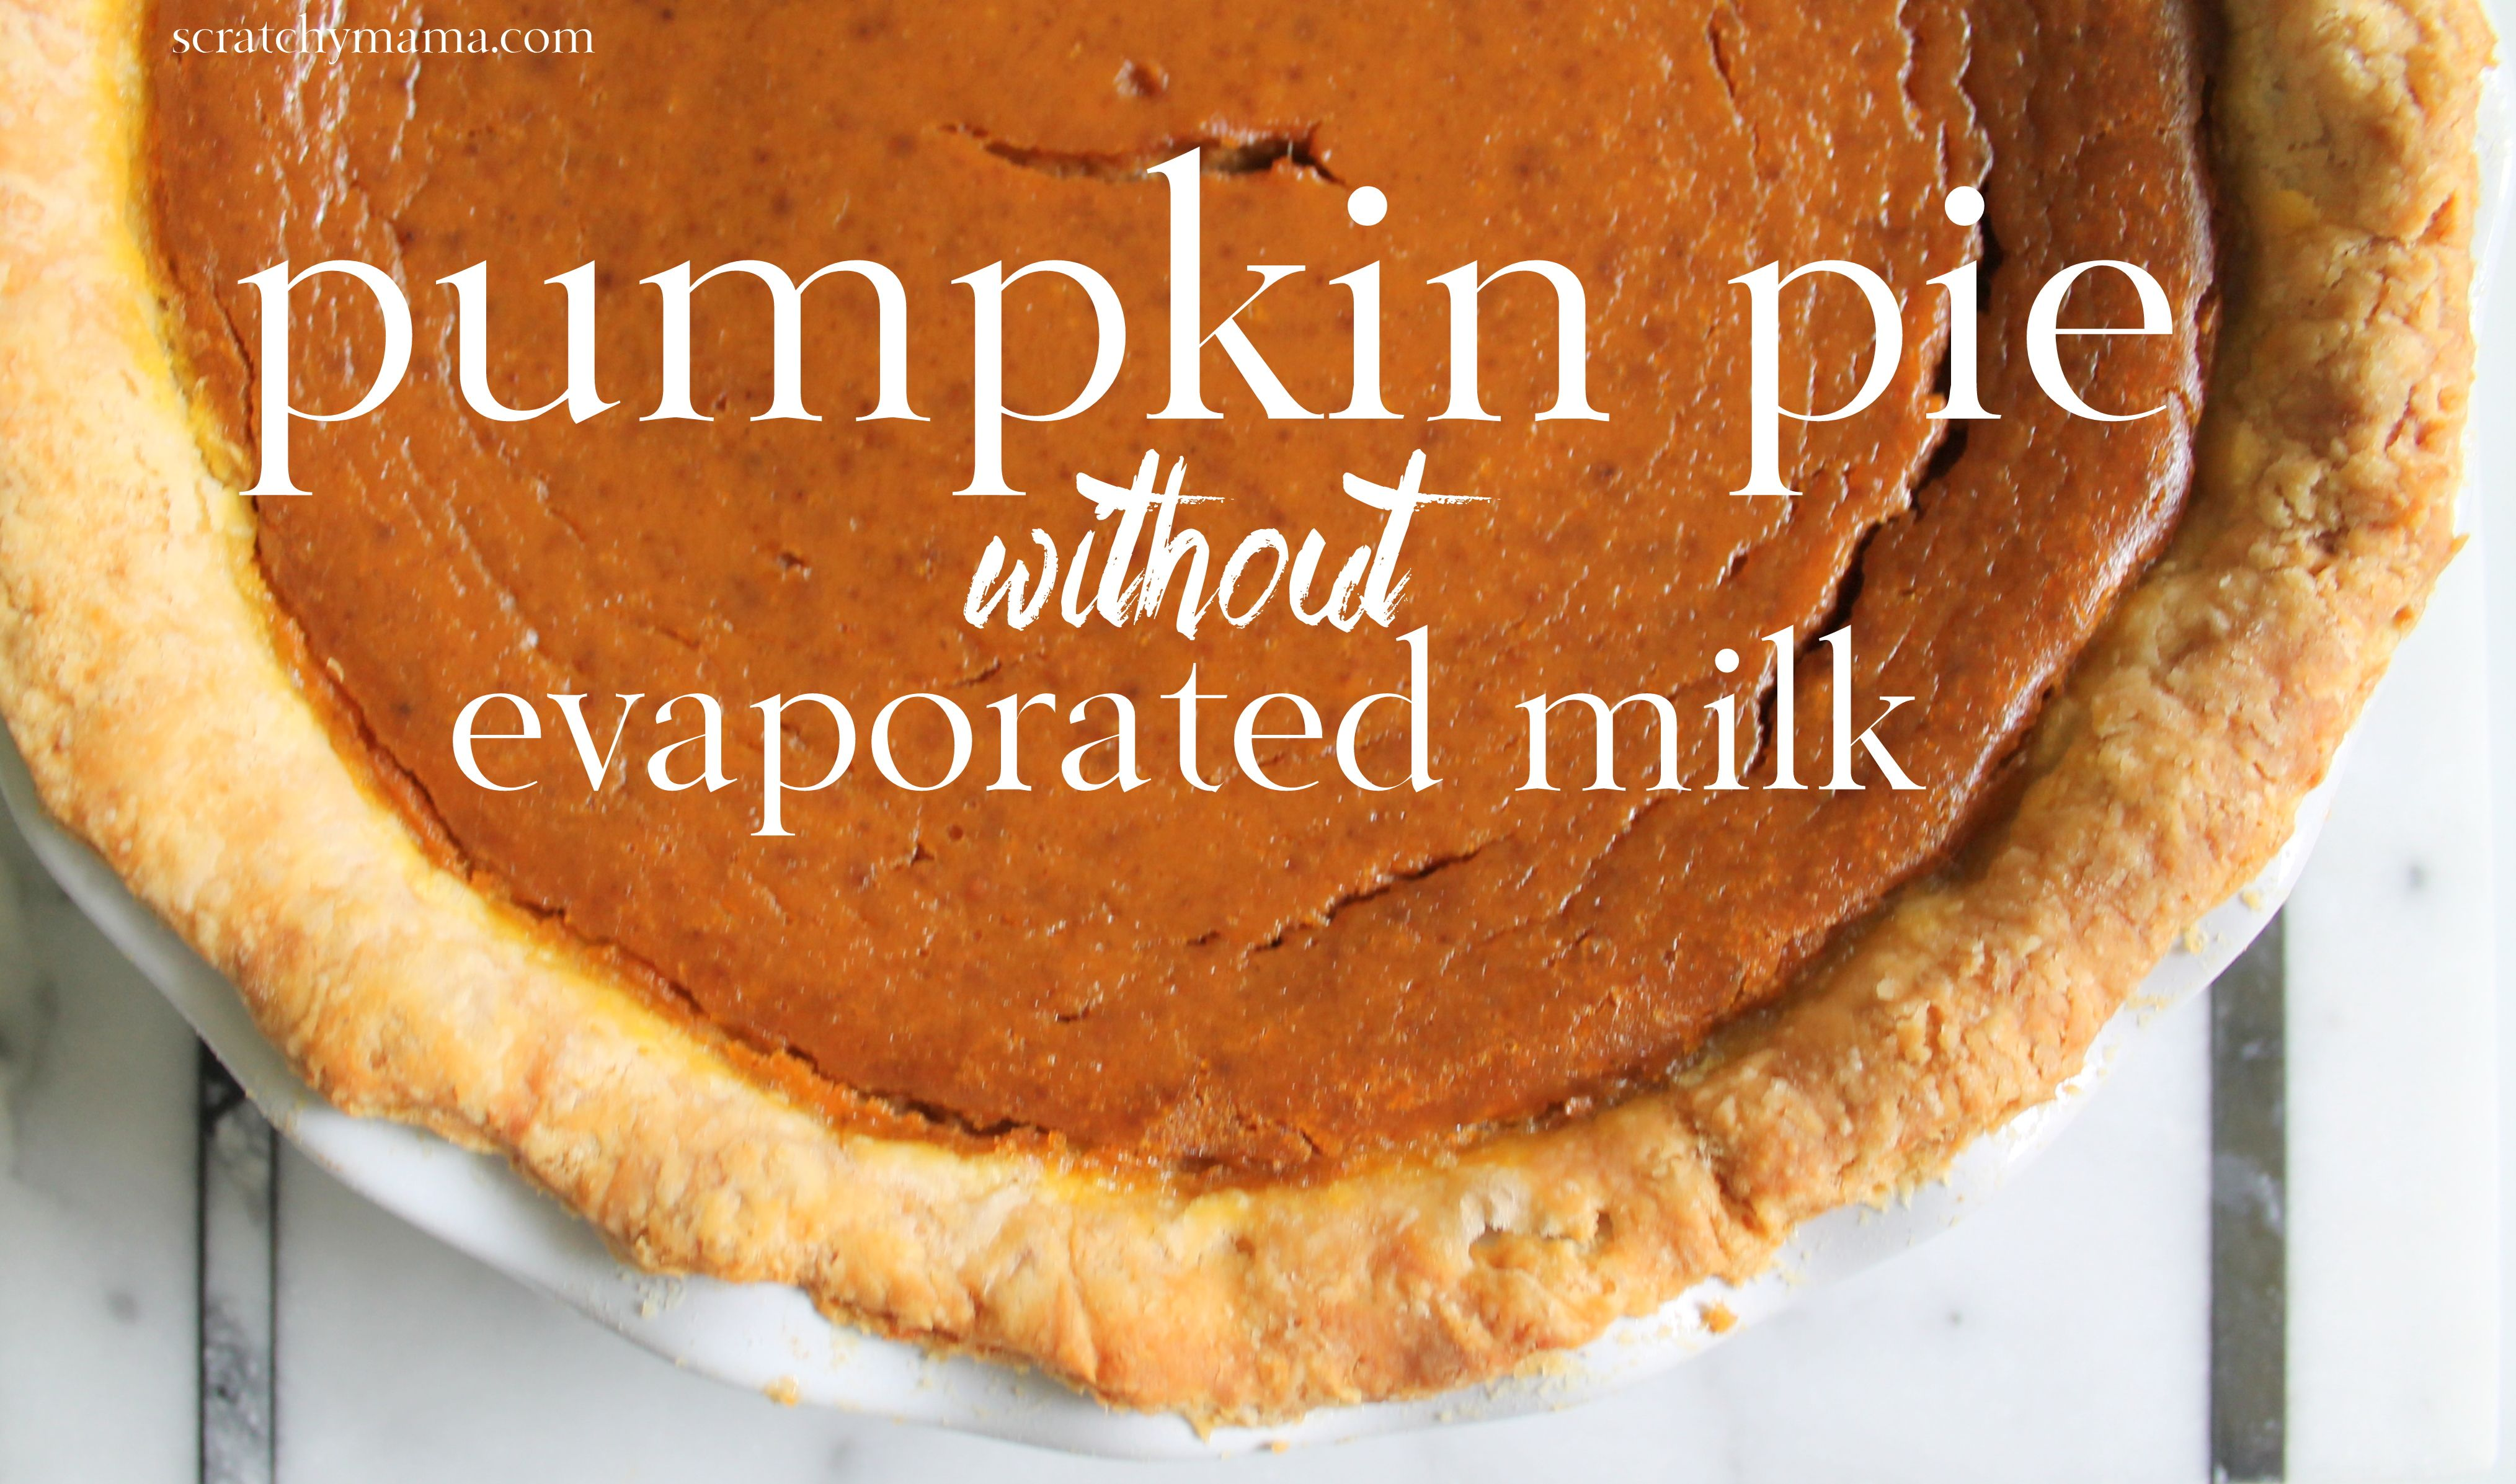 Pumpkin Pie Without Evaporated Milk Scratchy Mama Best Pumpkin Pie How Sweet Eats Dessert Recipes